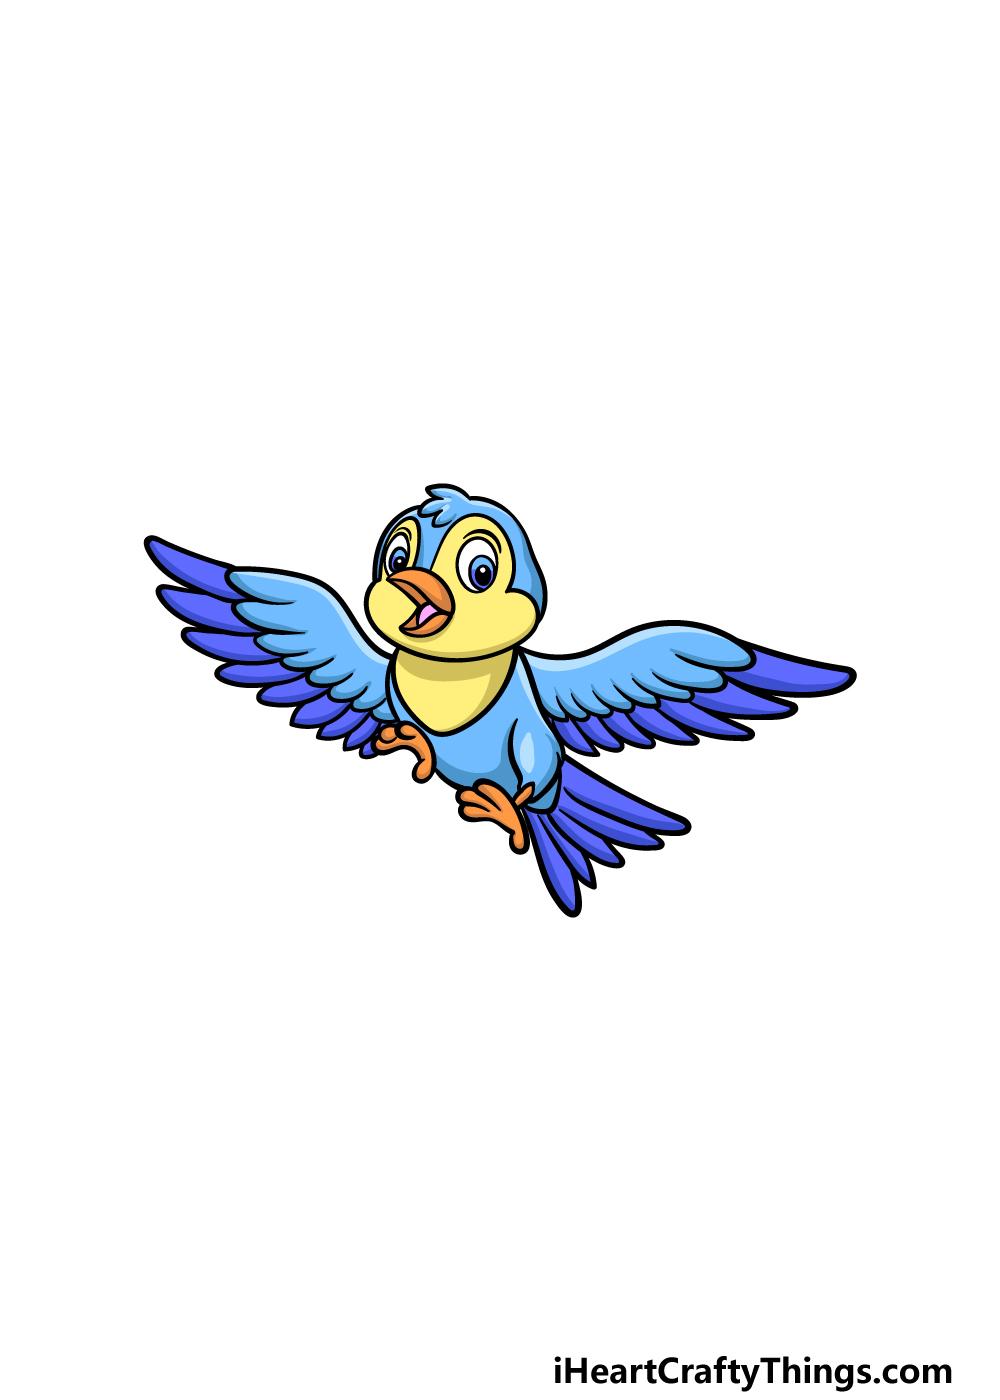 how to draw a cartoon bird step 6